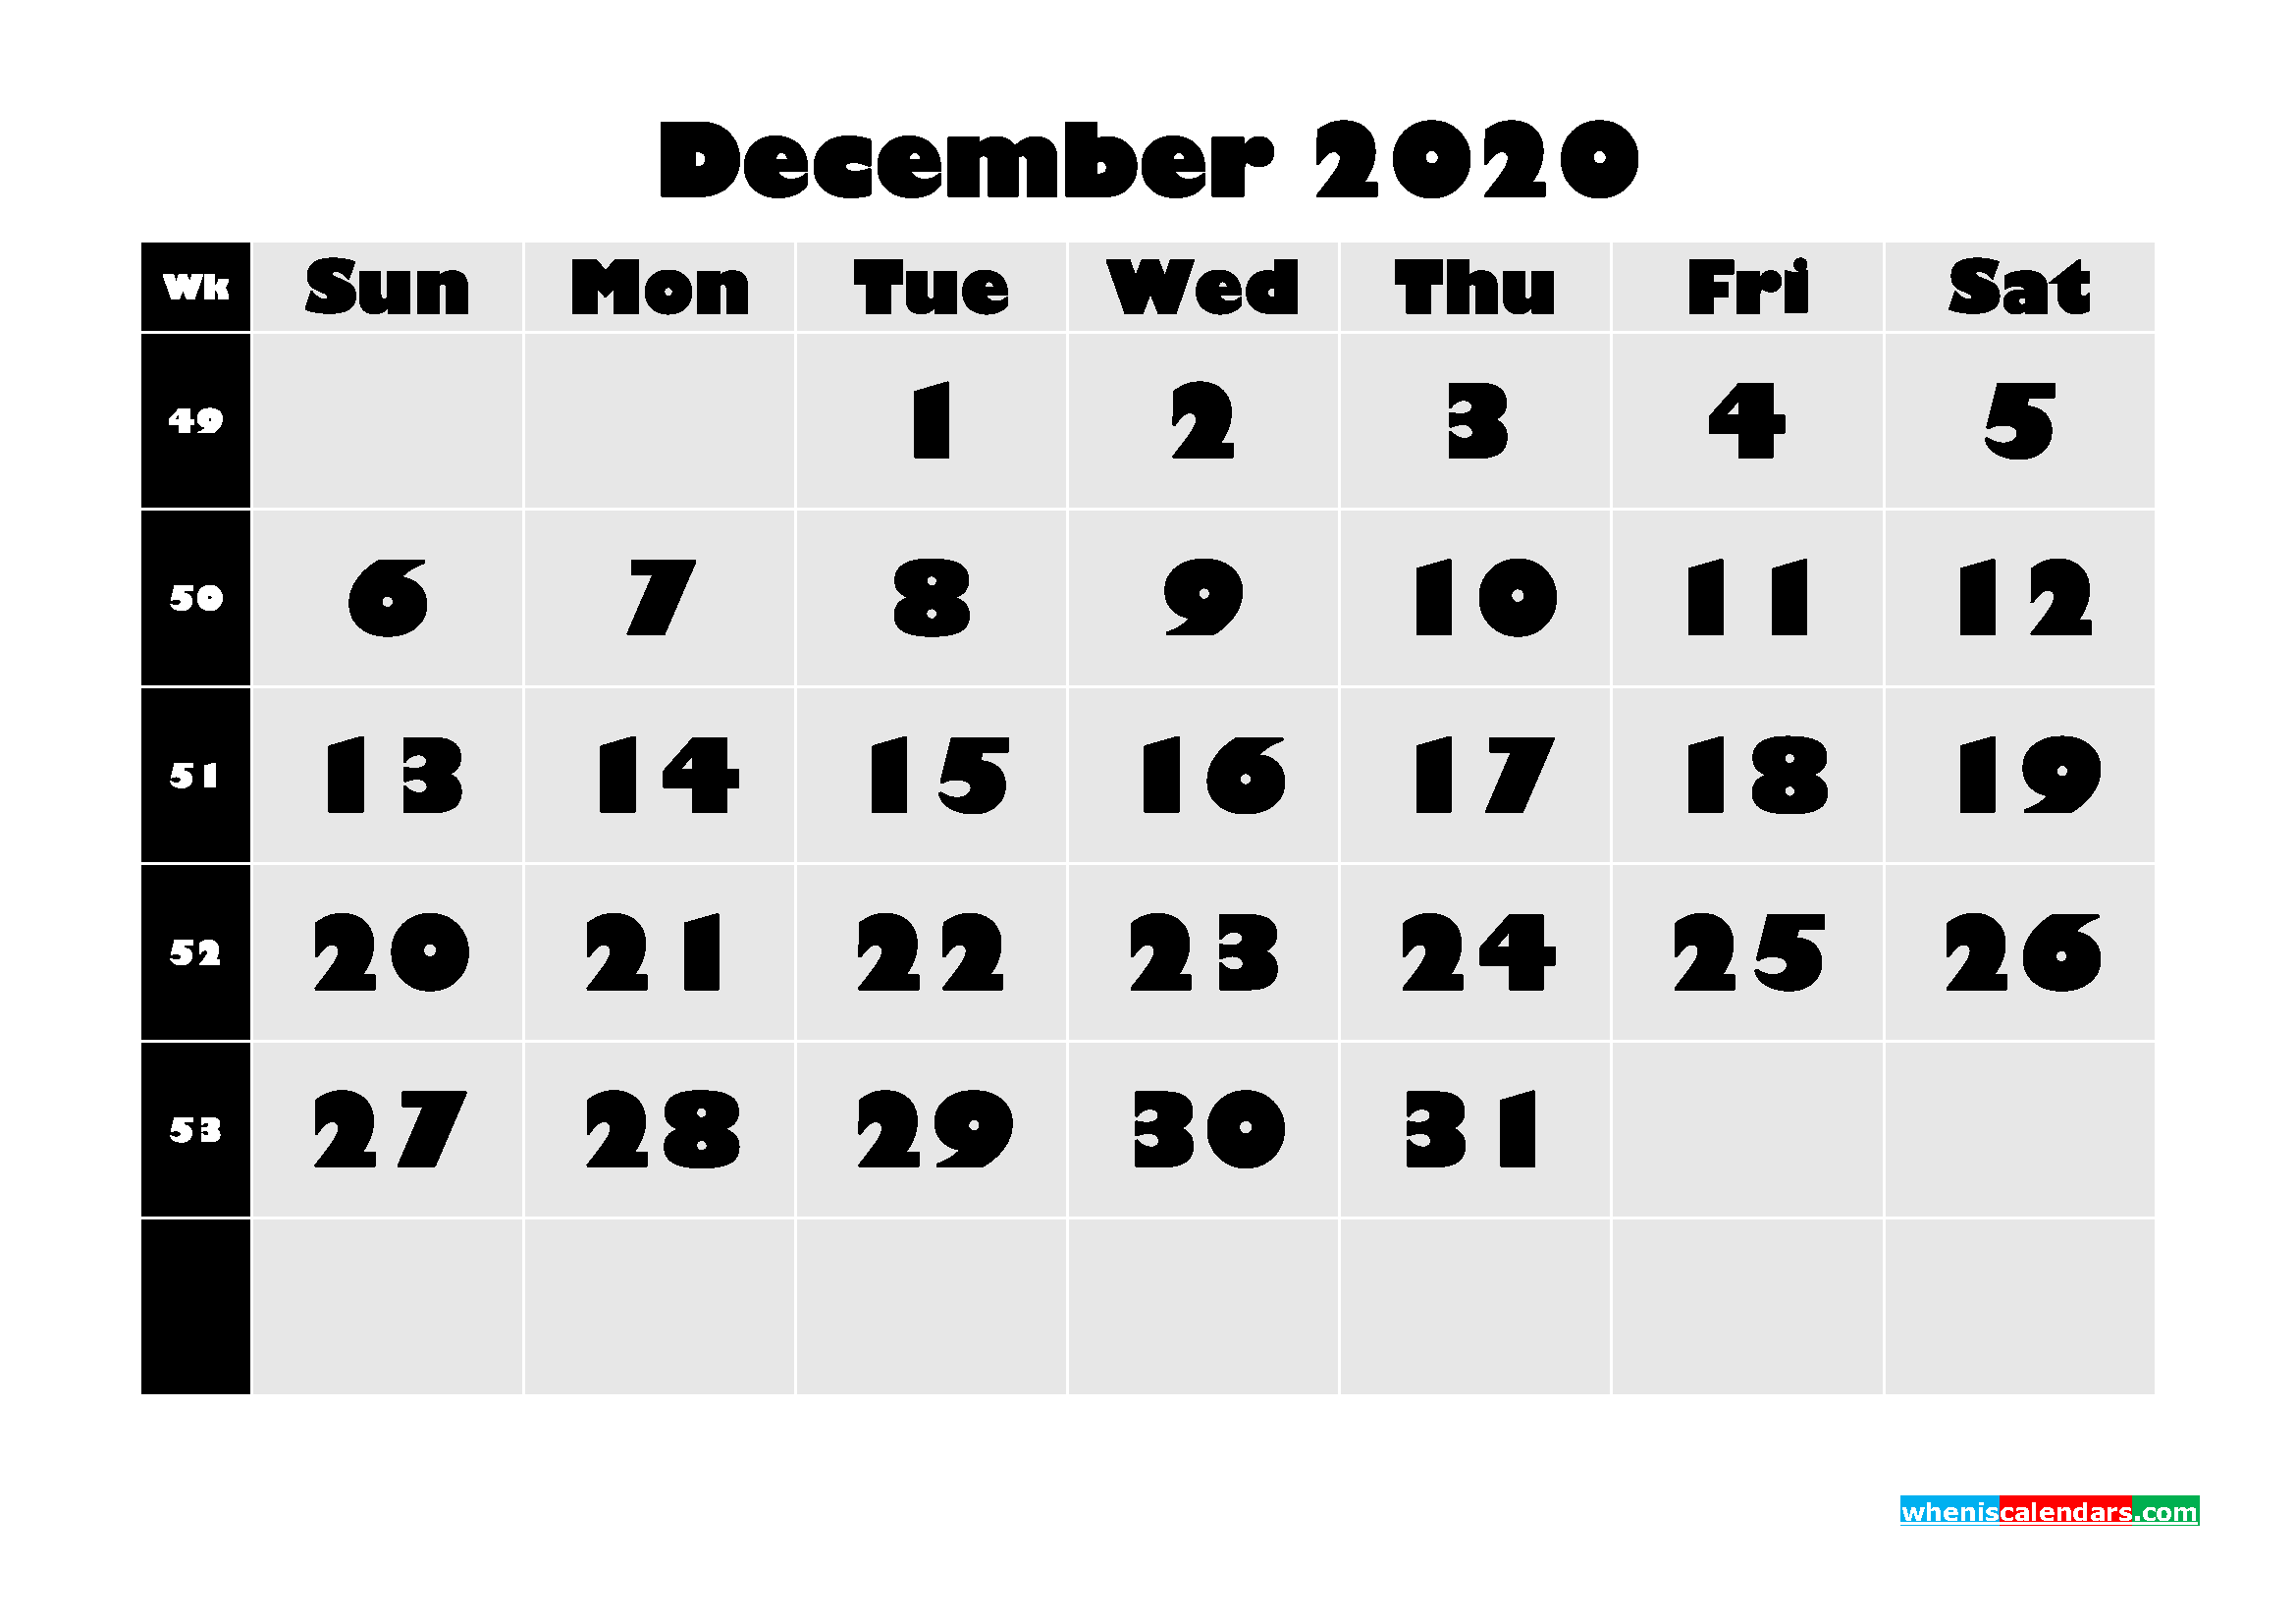 Blank December 2020 Calendar Printable - No.m20b636